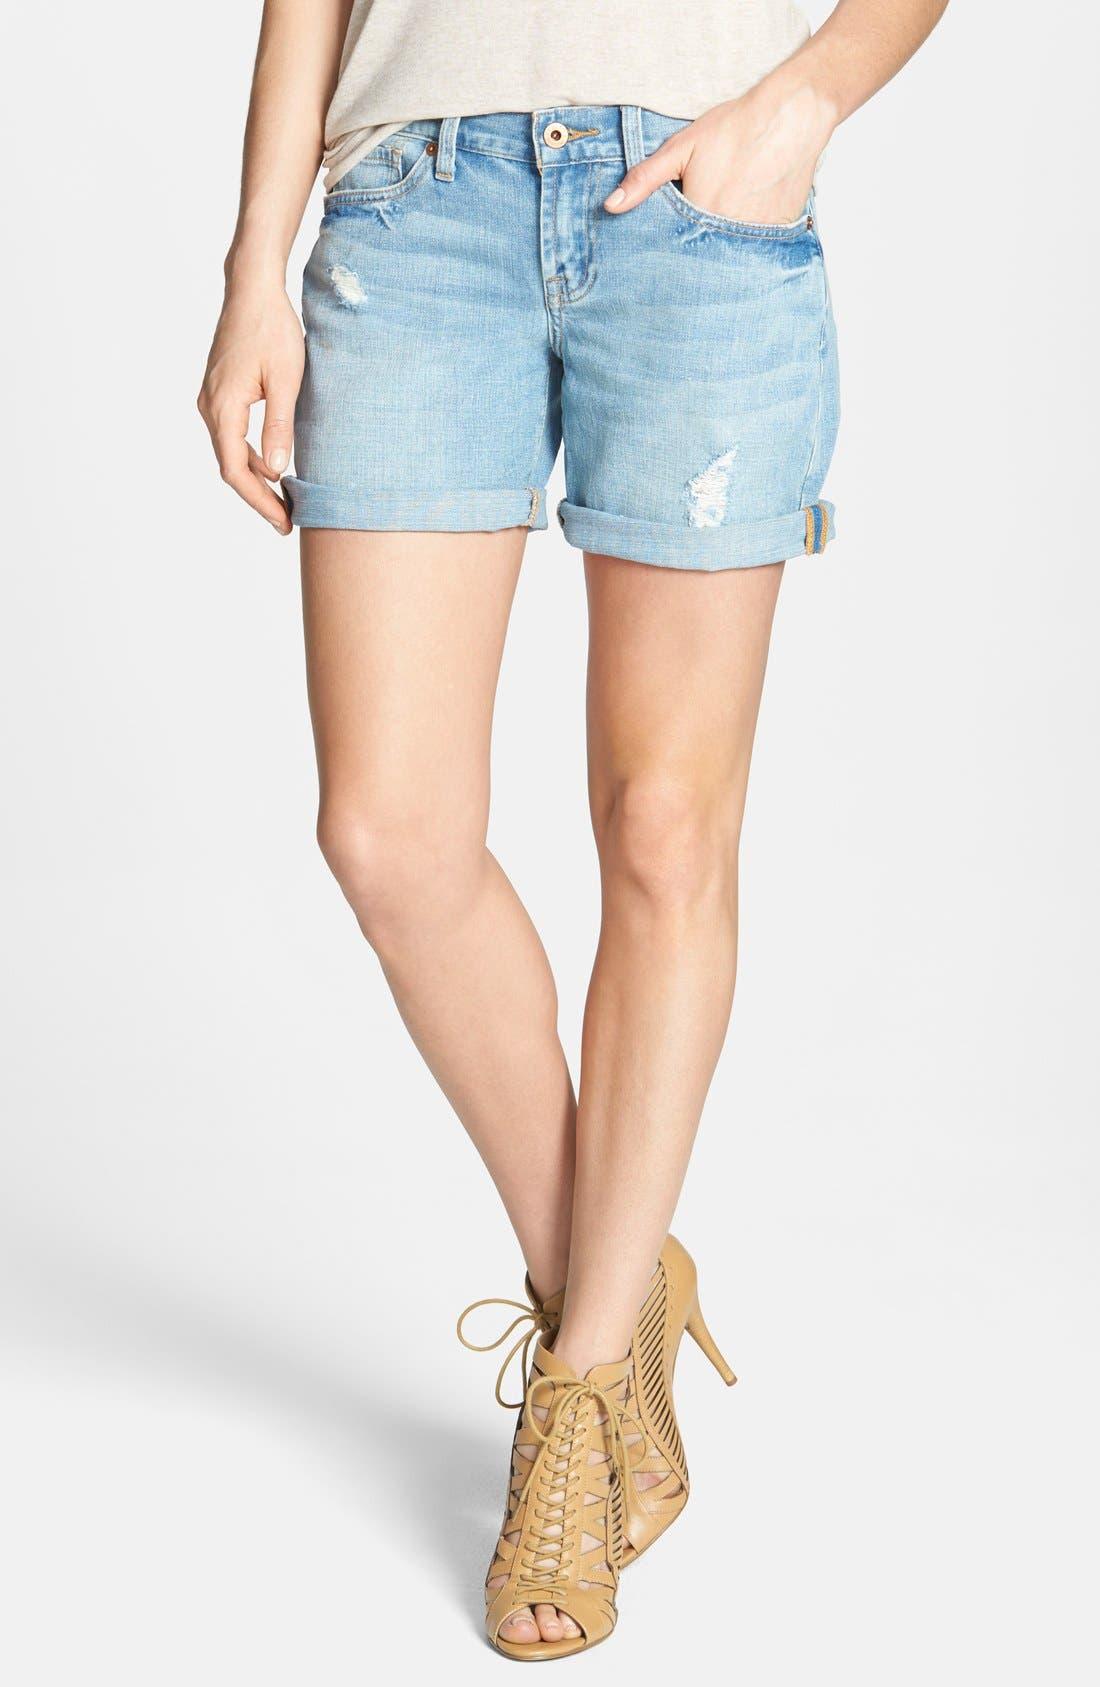 Alternate Image 1 Selected - Lucky Brand 'Laguna' Distressed Denim Shorts (Hudlow)